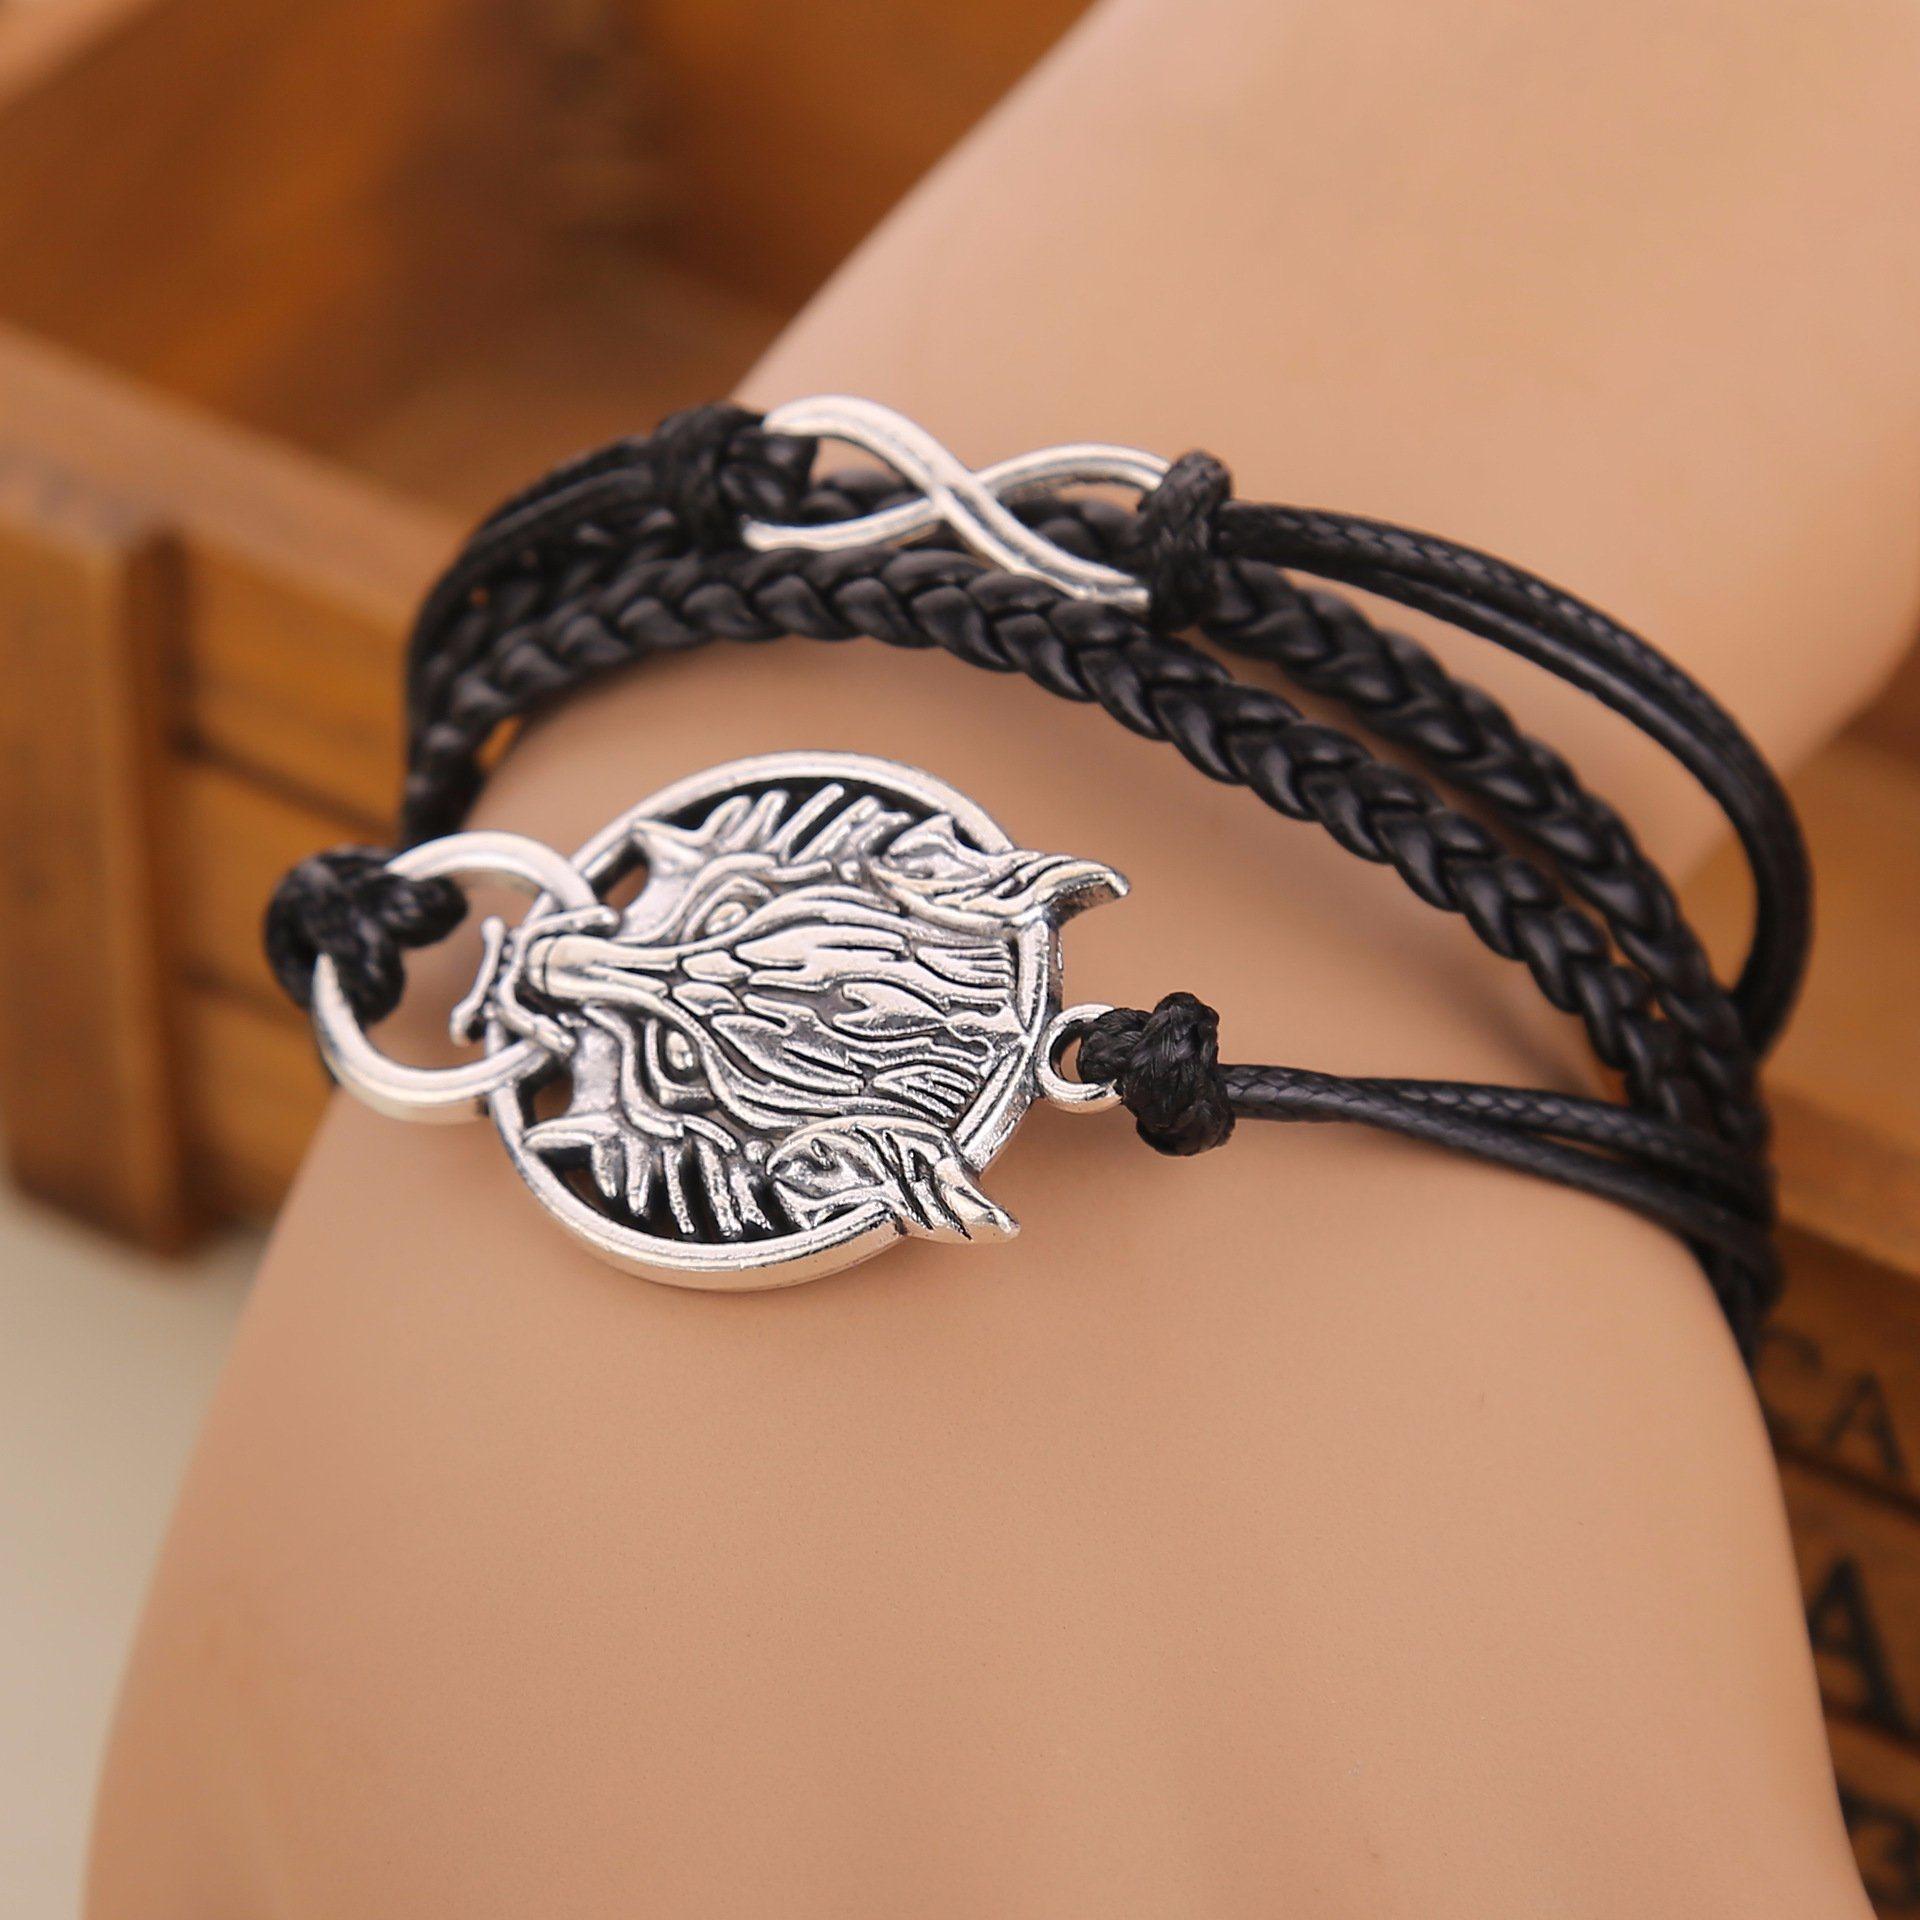 Imitation Jewelry-Black Braided Leather Rope Zinc Alloy Wolf Head Infinity Knot Bracelet for Men